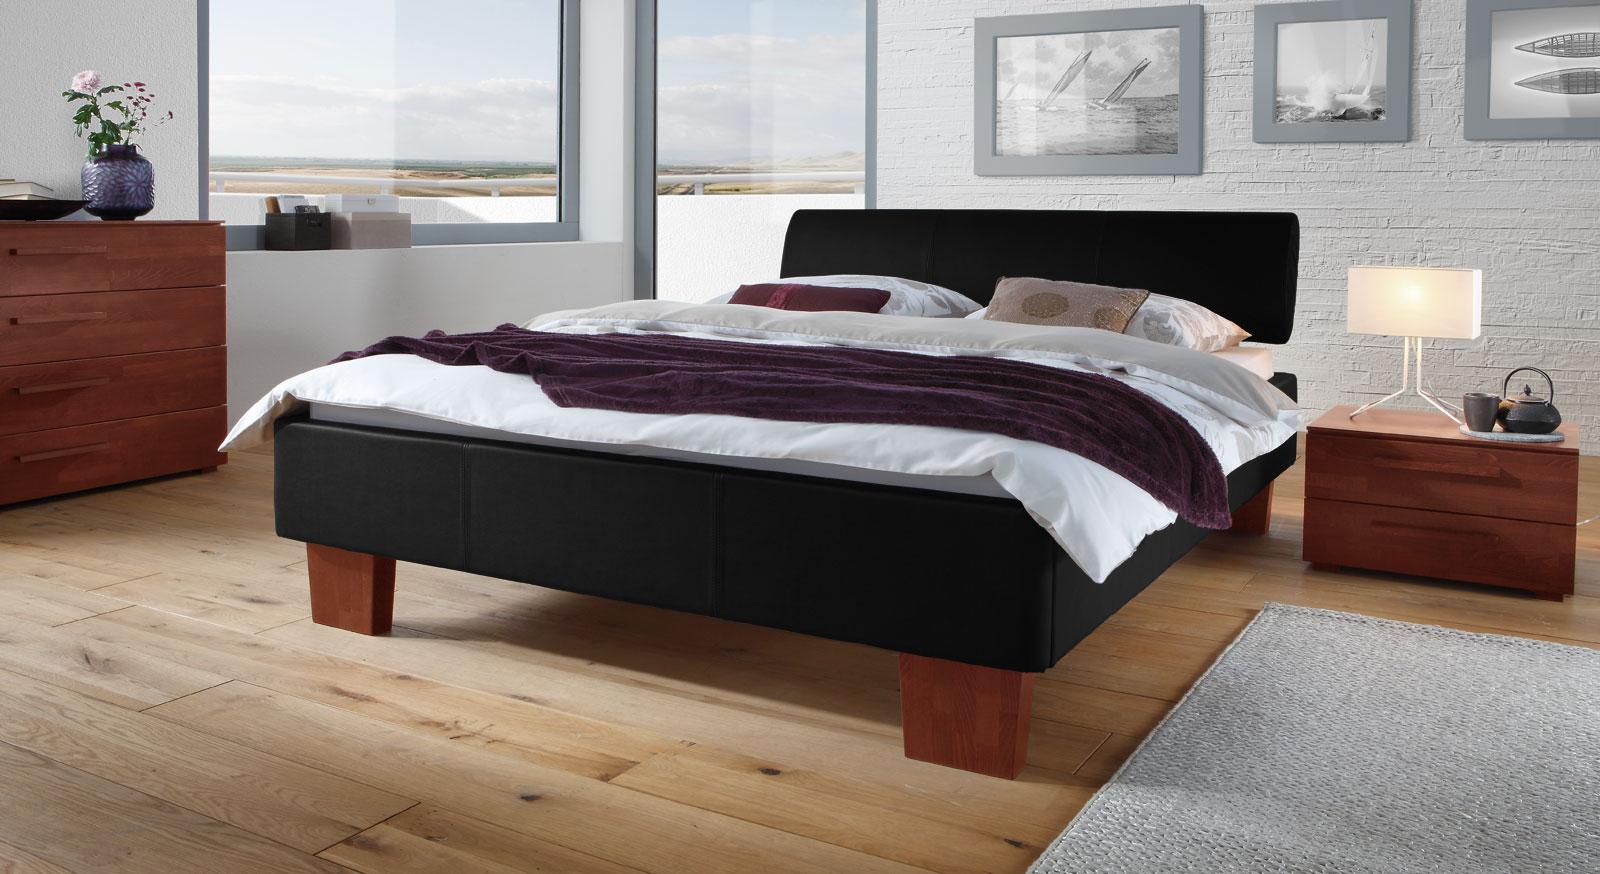 polsterbett mit kunstleder in z b wei lopo. Black Bedroom Furniture Sets. Home Design Ideas